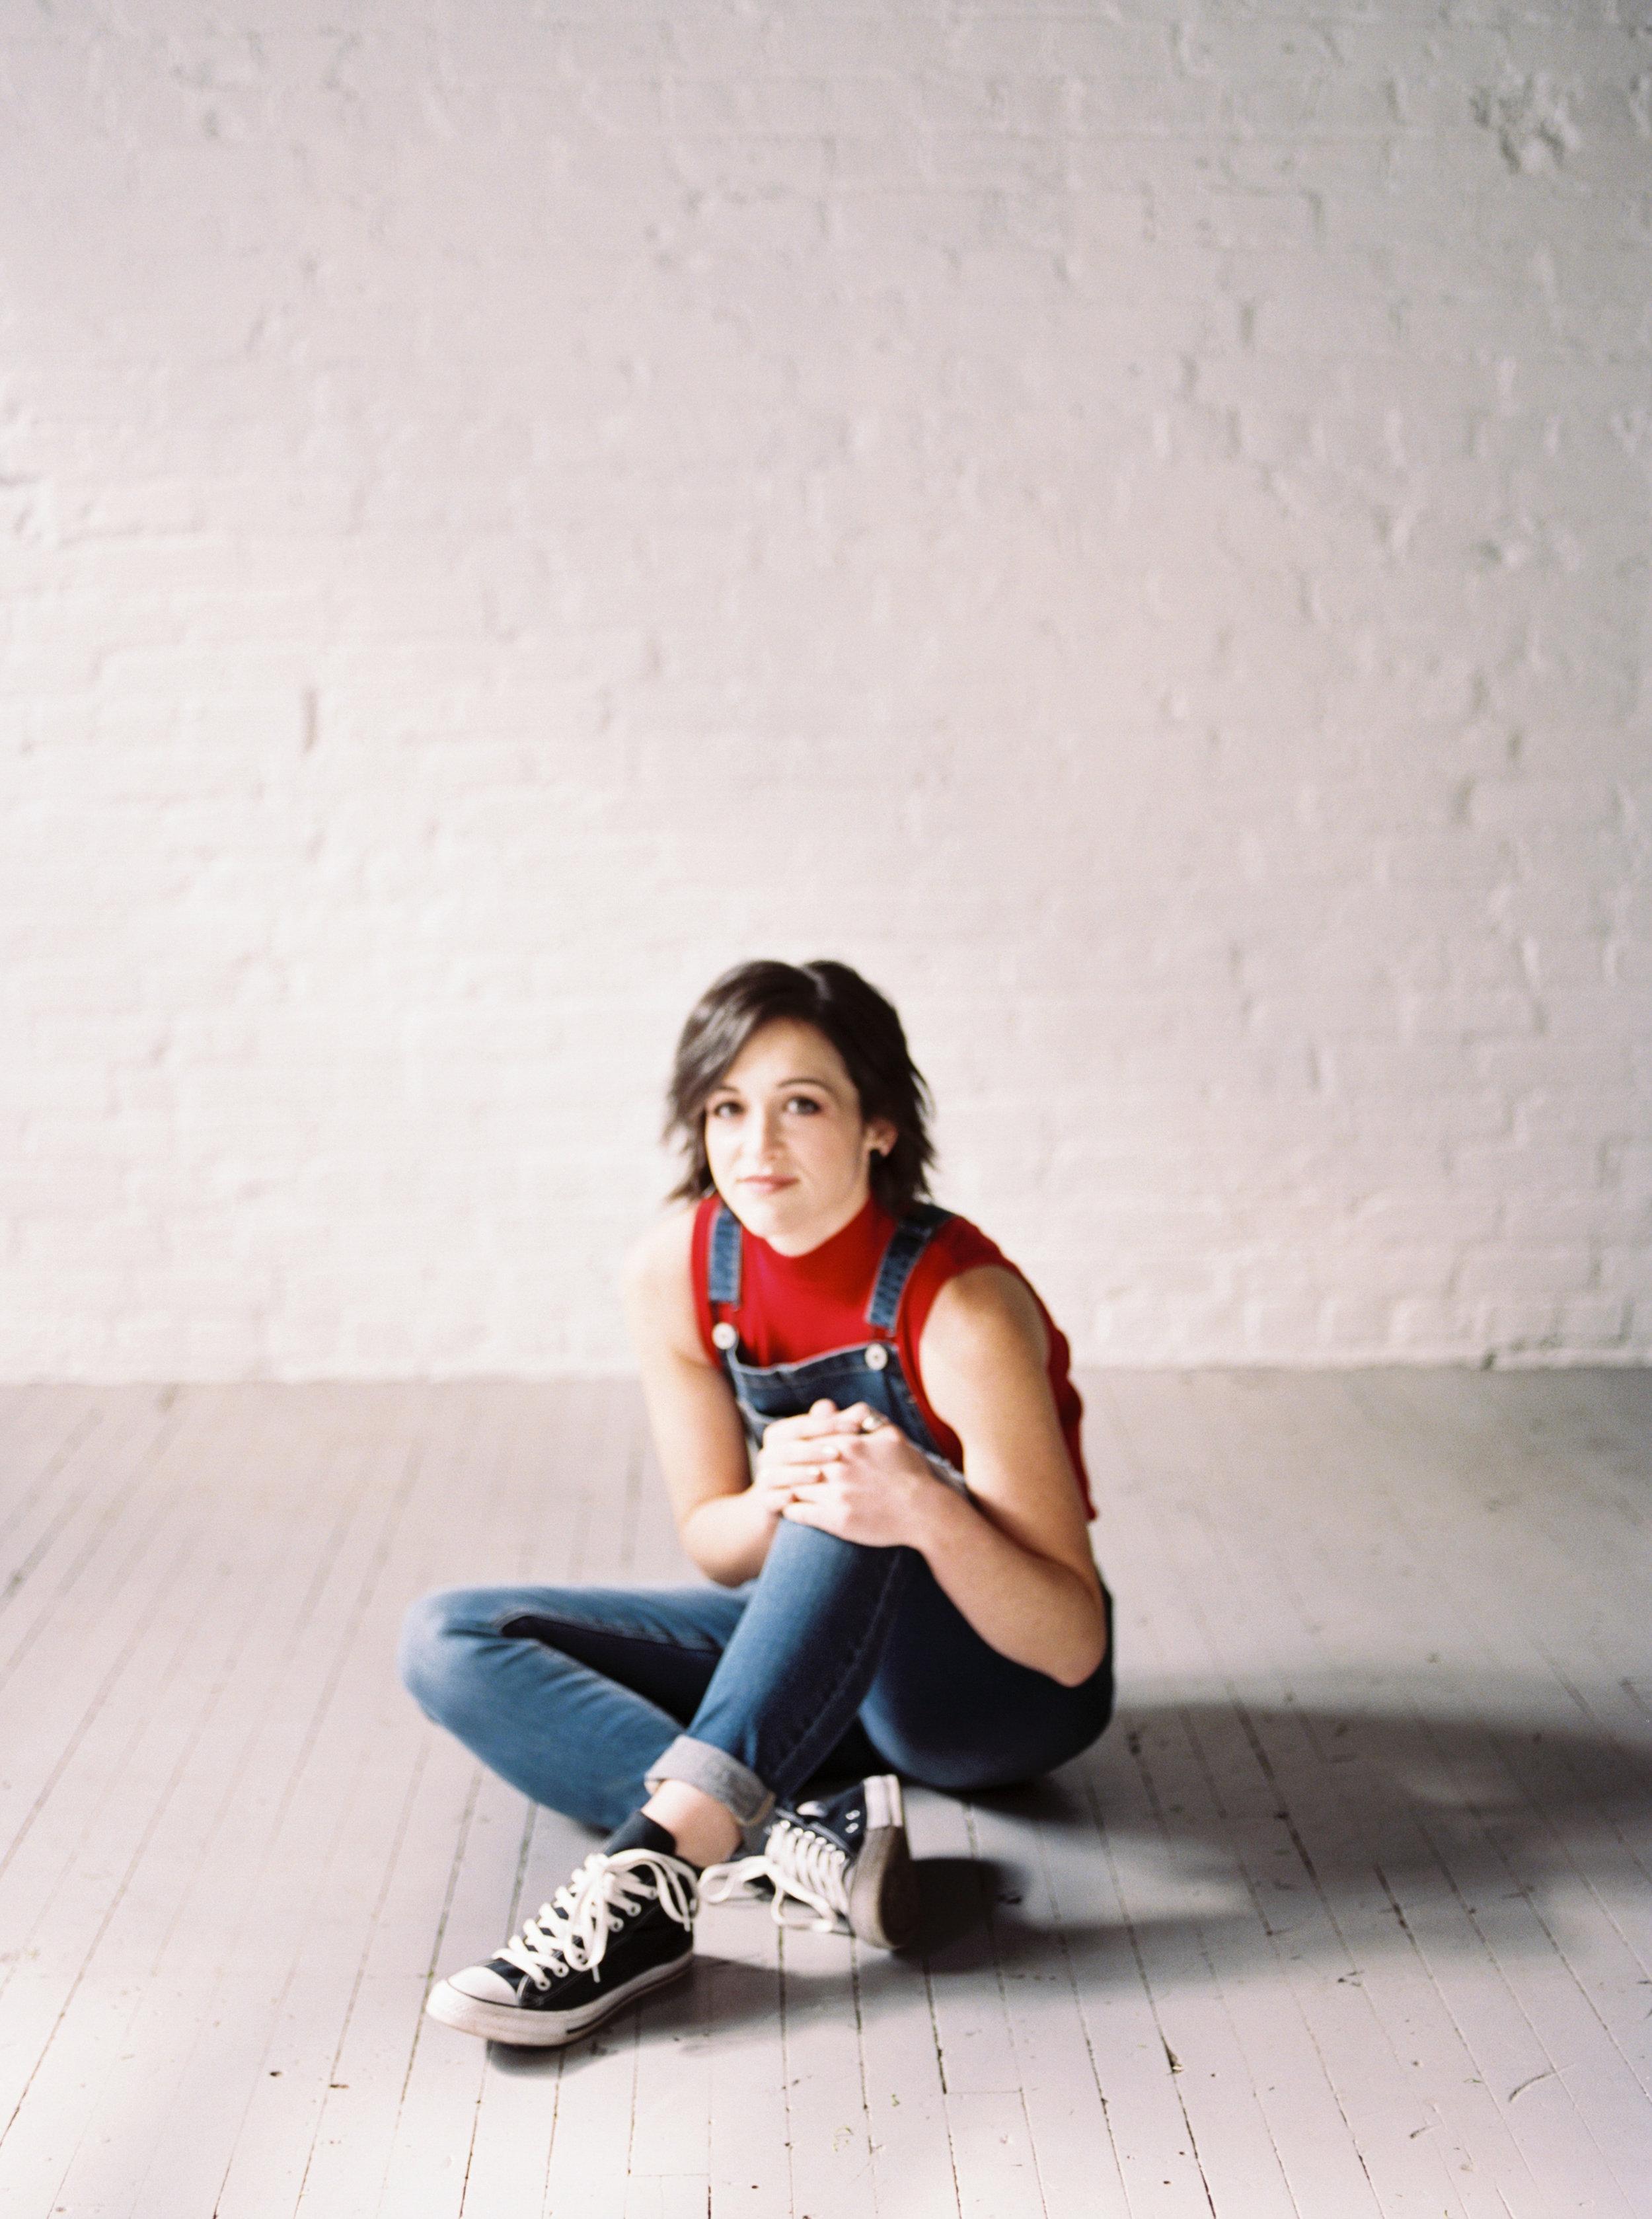 Dayton_Ohio_Cincinnati_Columbus_Cleveland_Film_Portrait_Photographer_Tonya_Espy-21.jpg